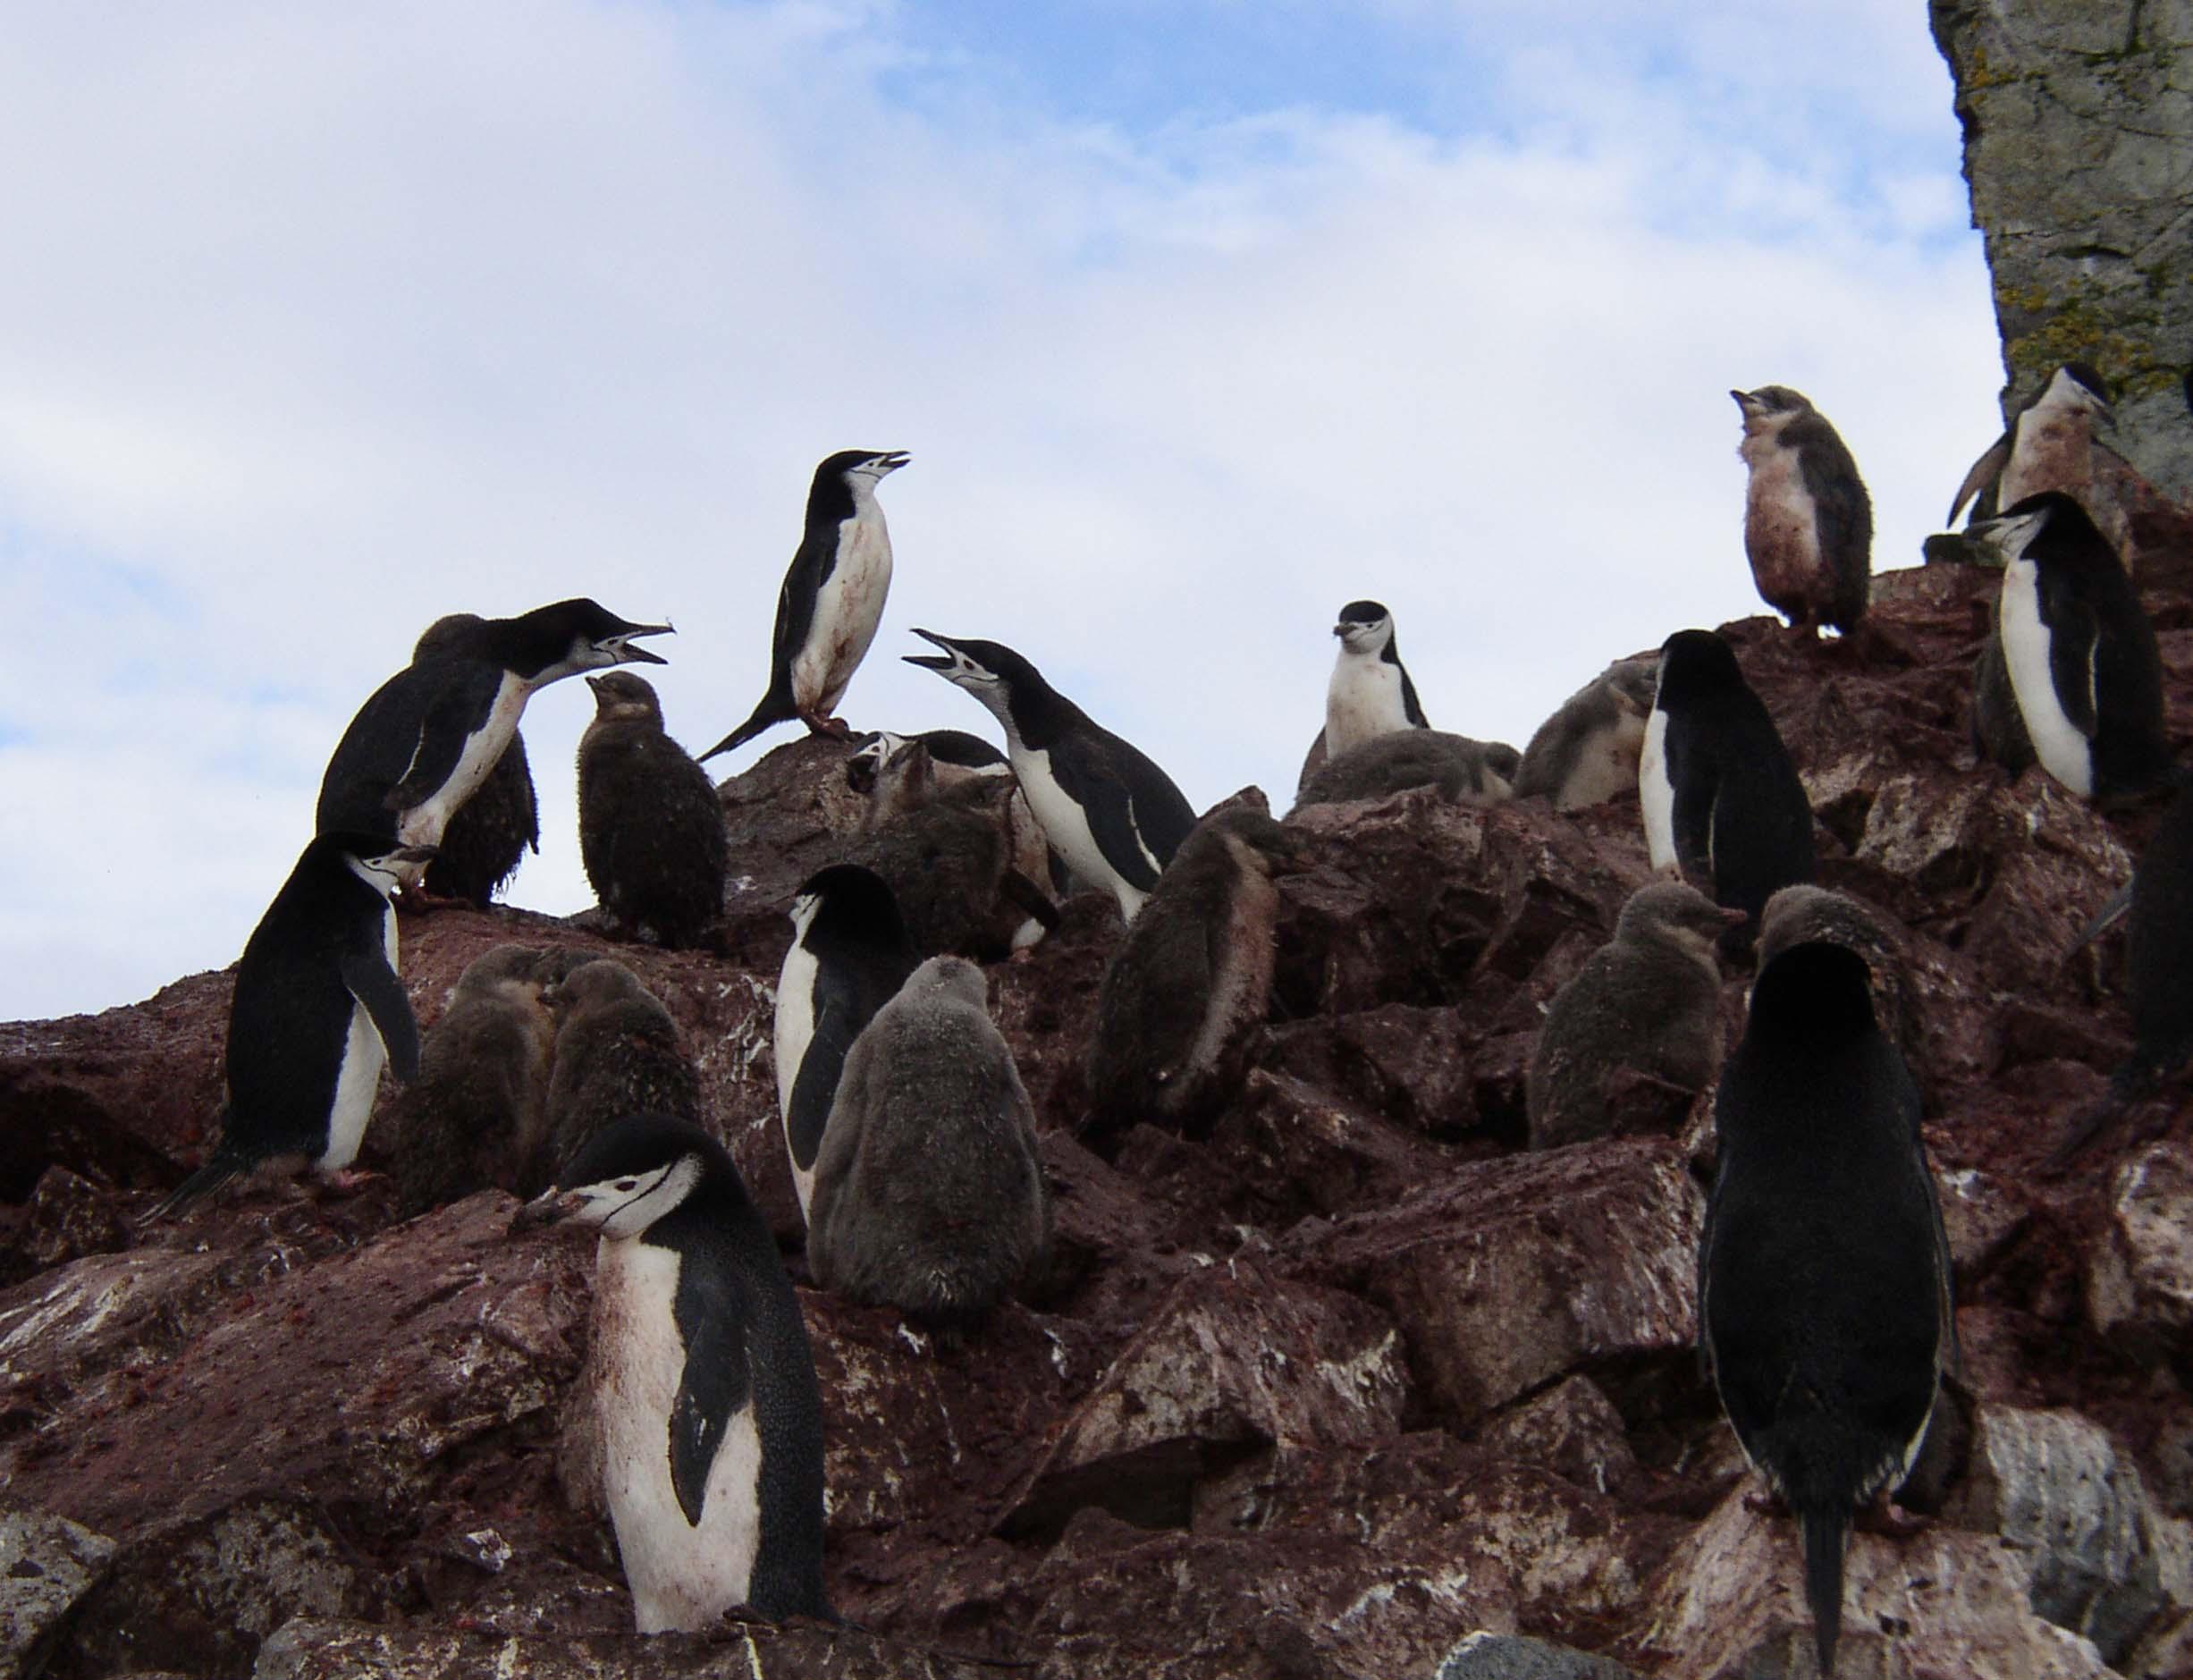 Group of penguins on rocks